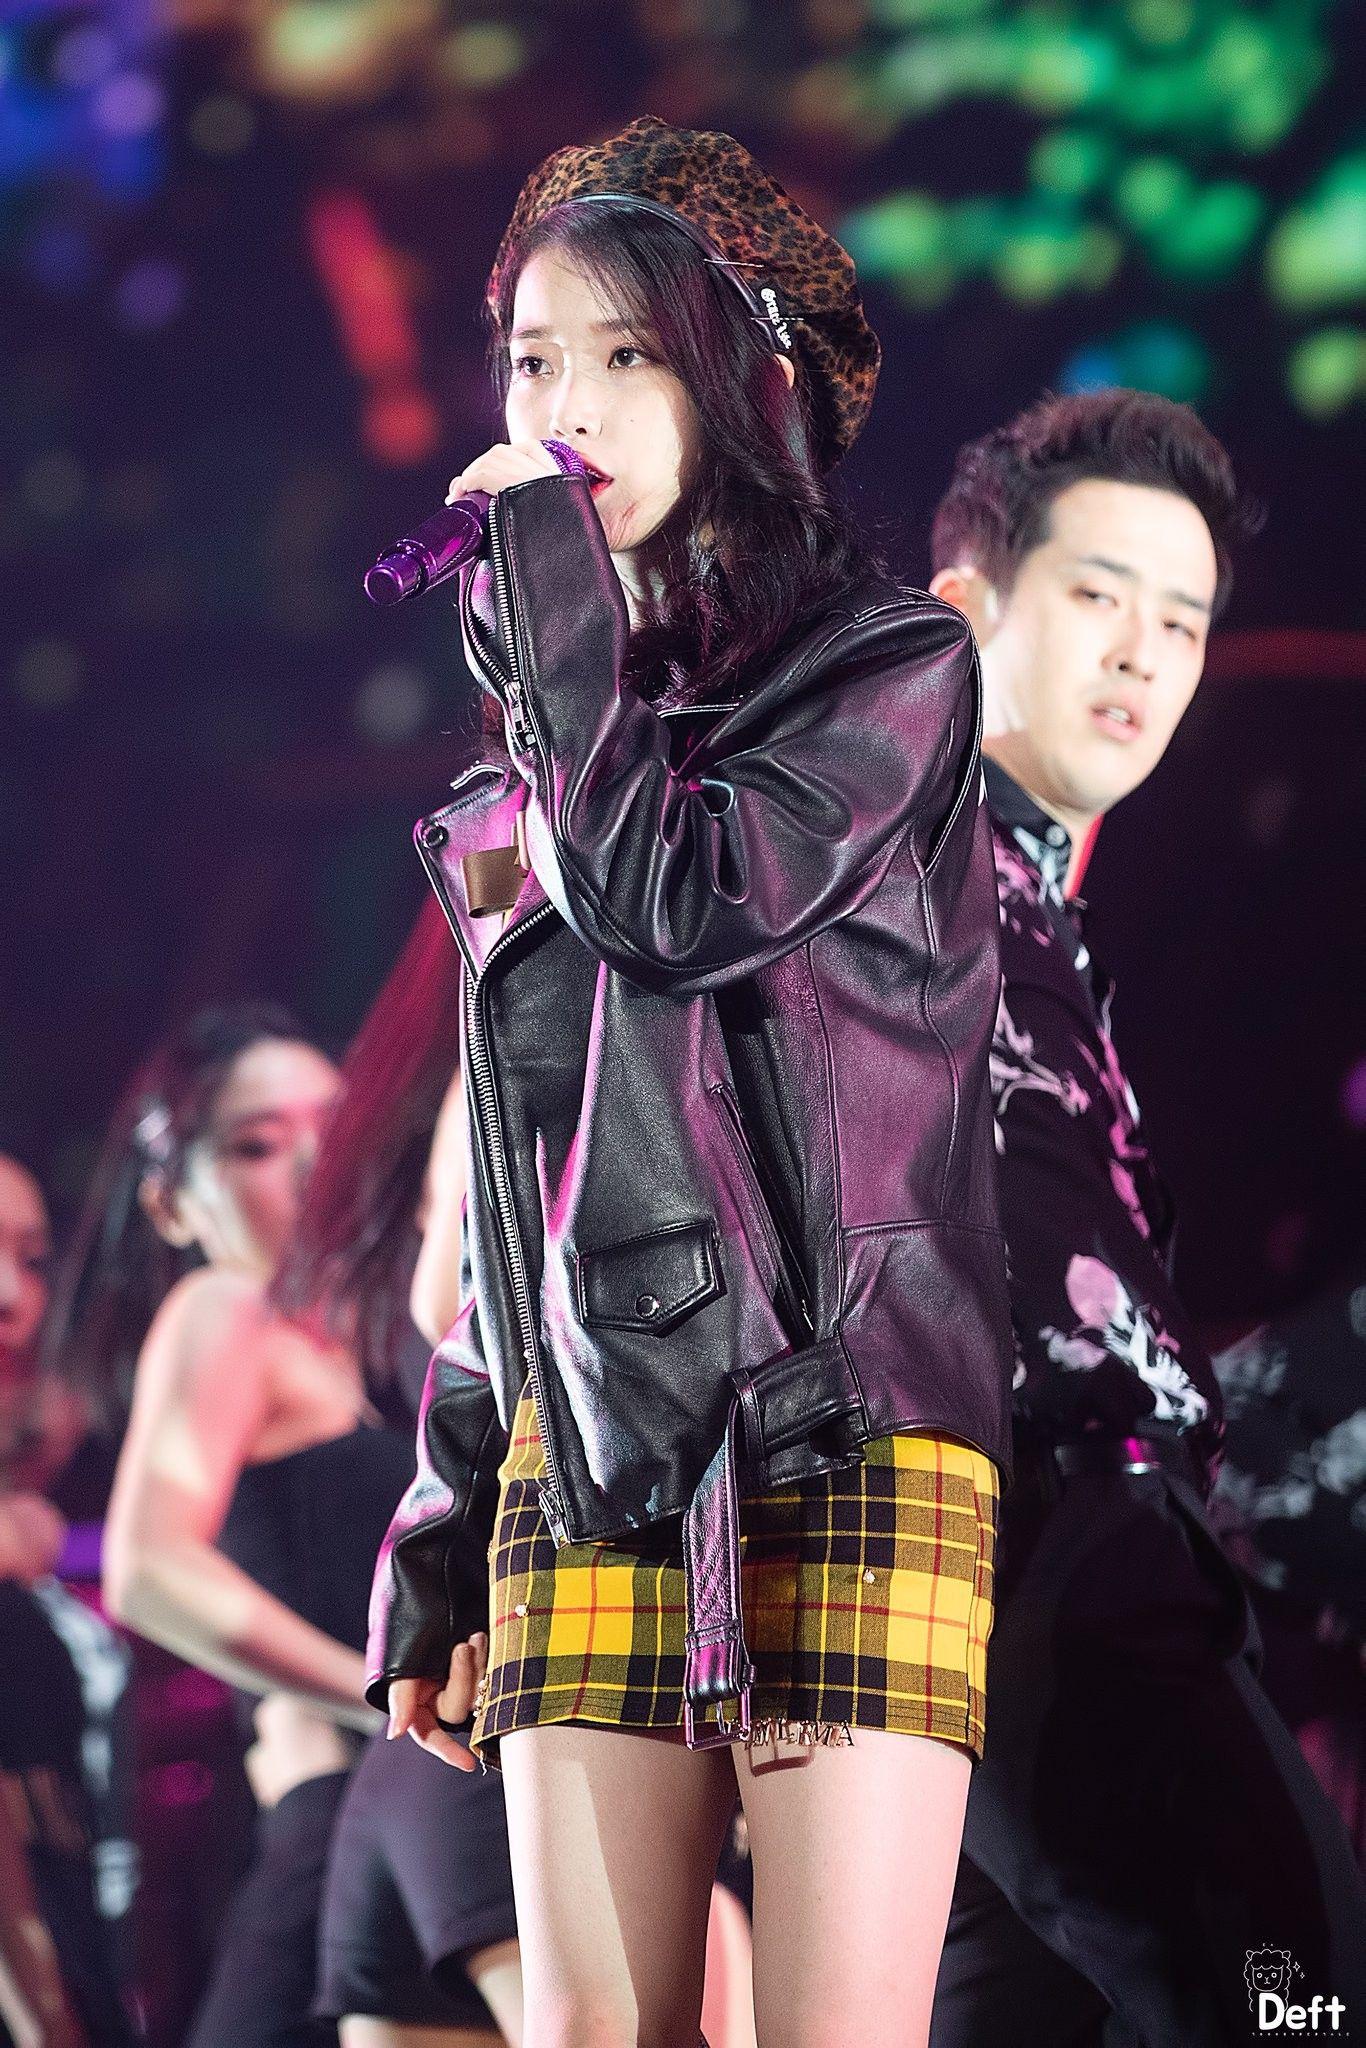 Iu Dlwlrma 10th Anniversary Tour Concert In Seoul Fashion Love Fashion Kpop Girls